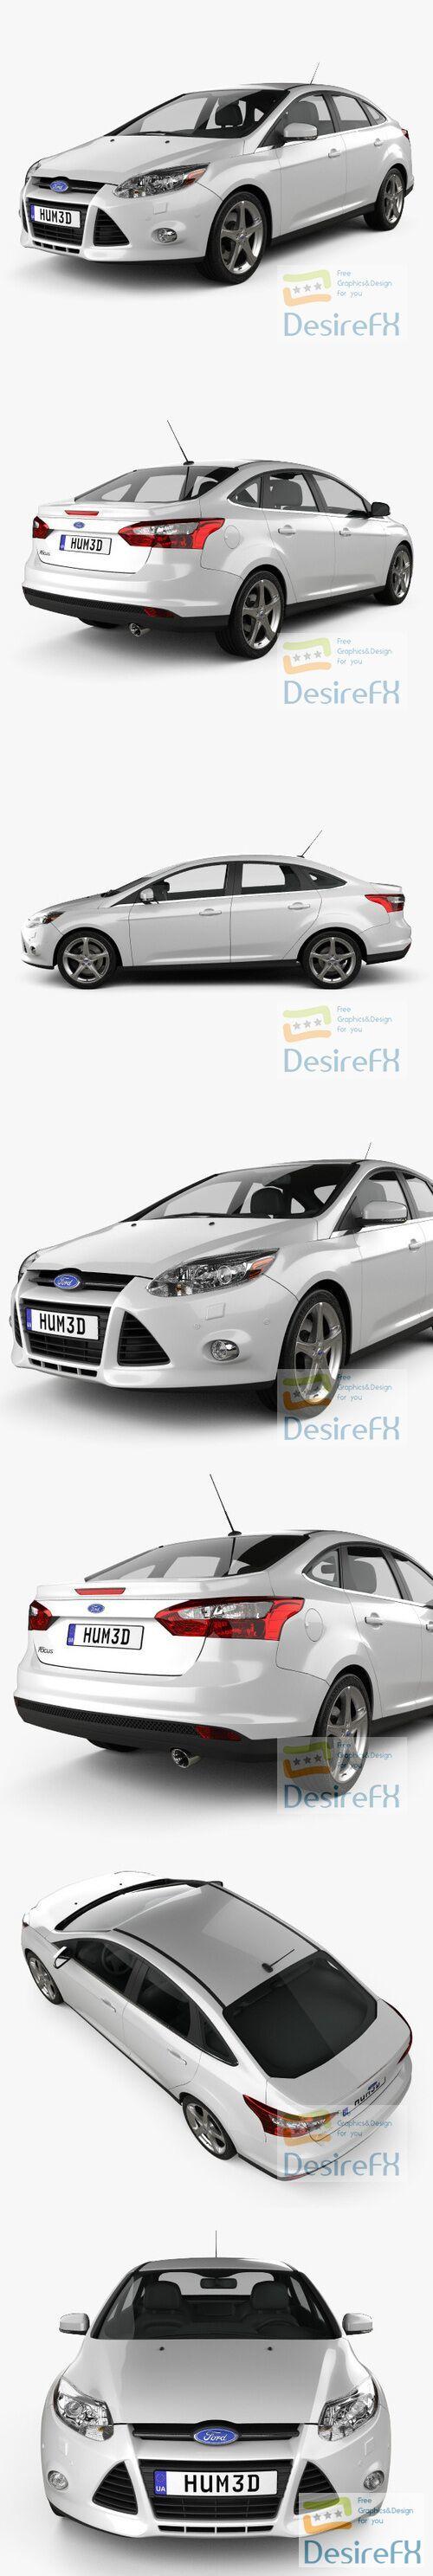 Ford Focus Sedan 2011 3D Model